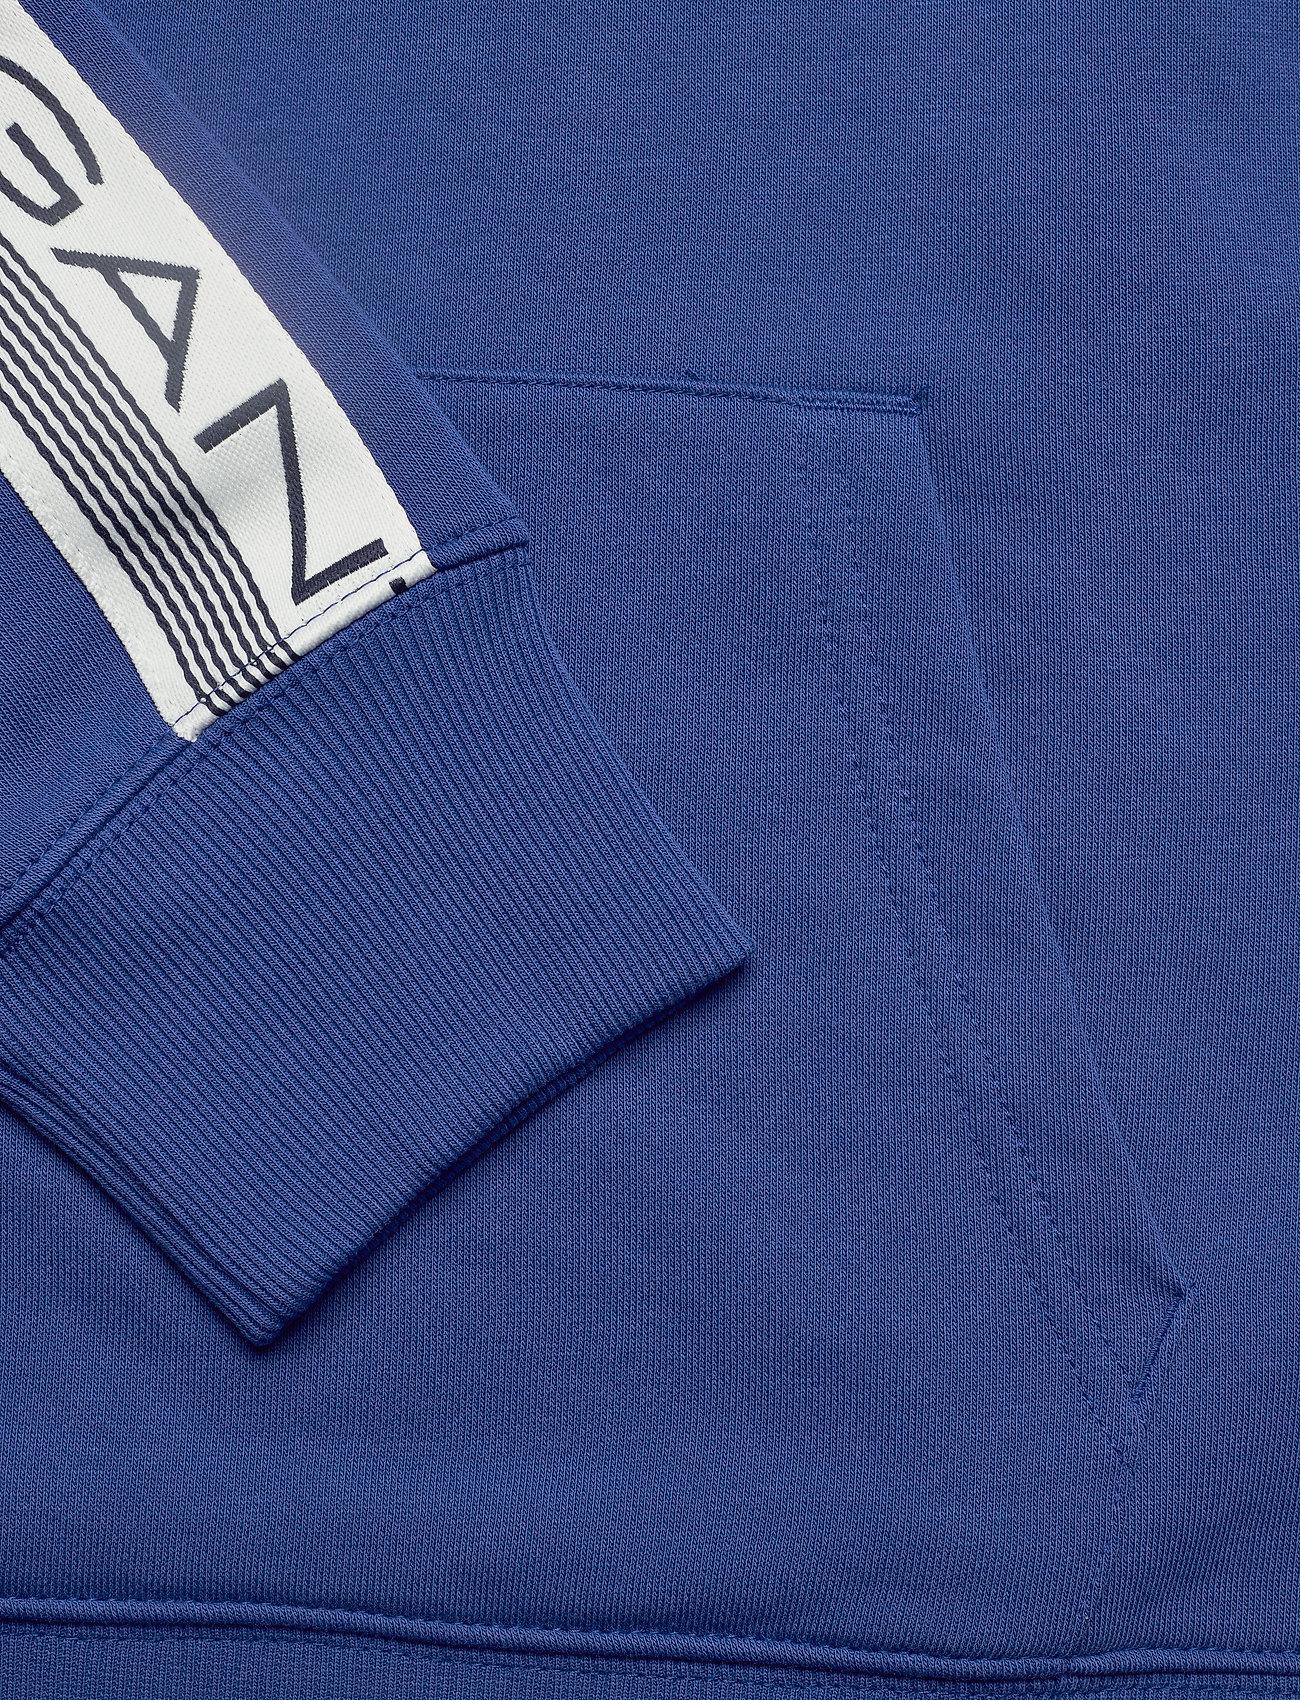 GANT D1. 13 STRIPES SWEAT HOODIE - Sweatshirts CRISP BLUE - Menn Klær